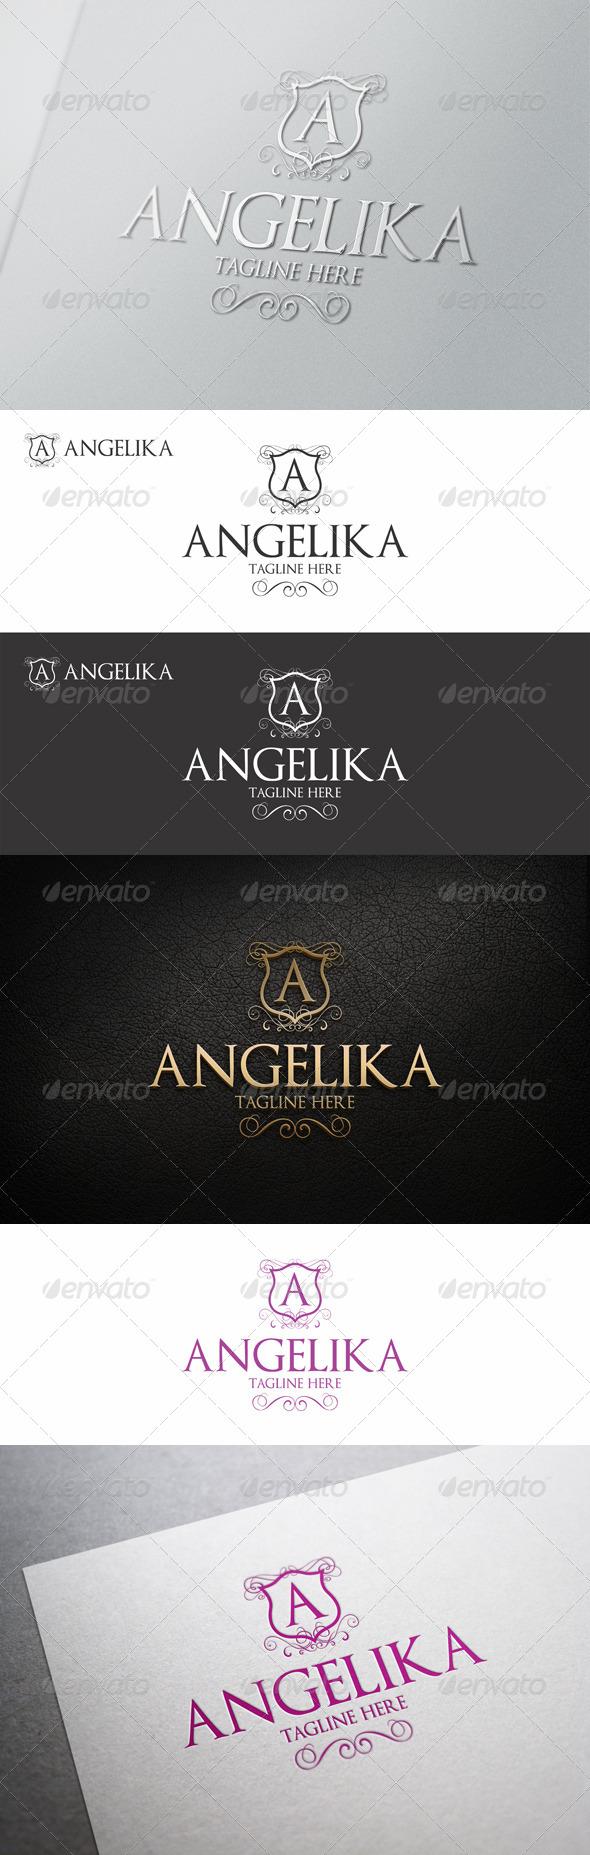 Angelika - Elegant Calligraphic Crest Logo - Crests Logo Templates